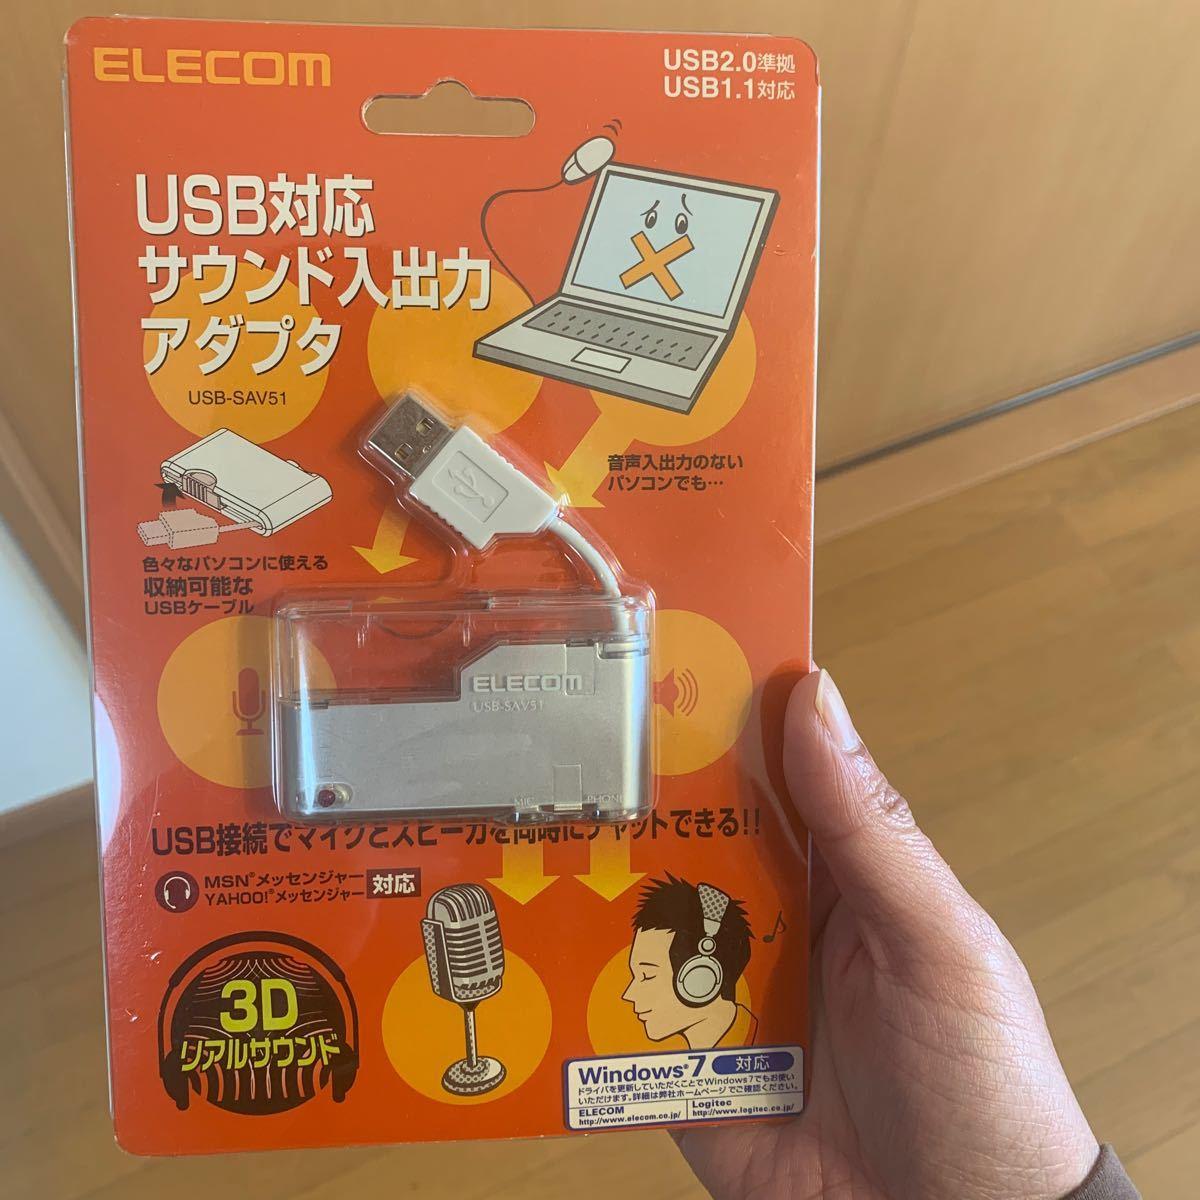 USBサウンドアダプタ USB-SAV51 エレコム